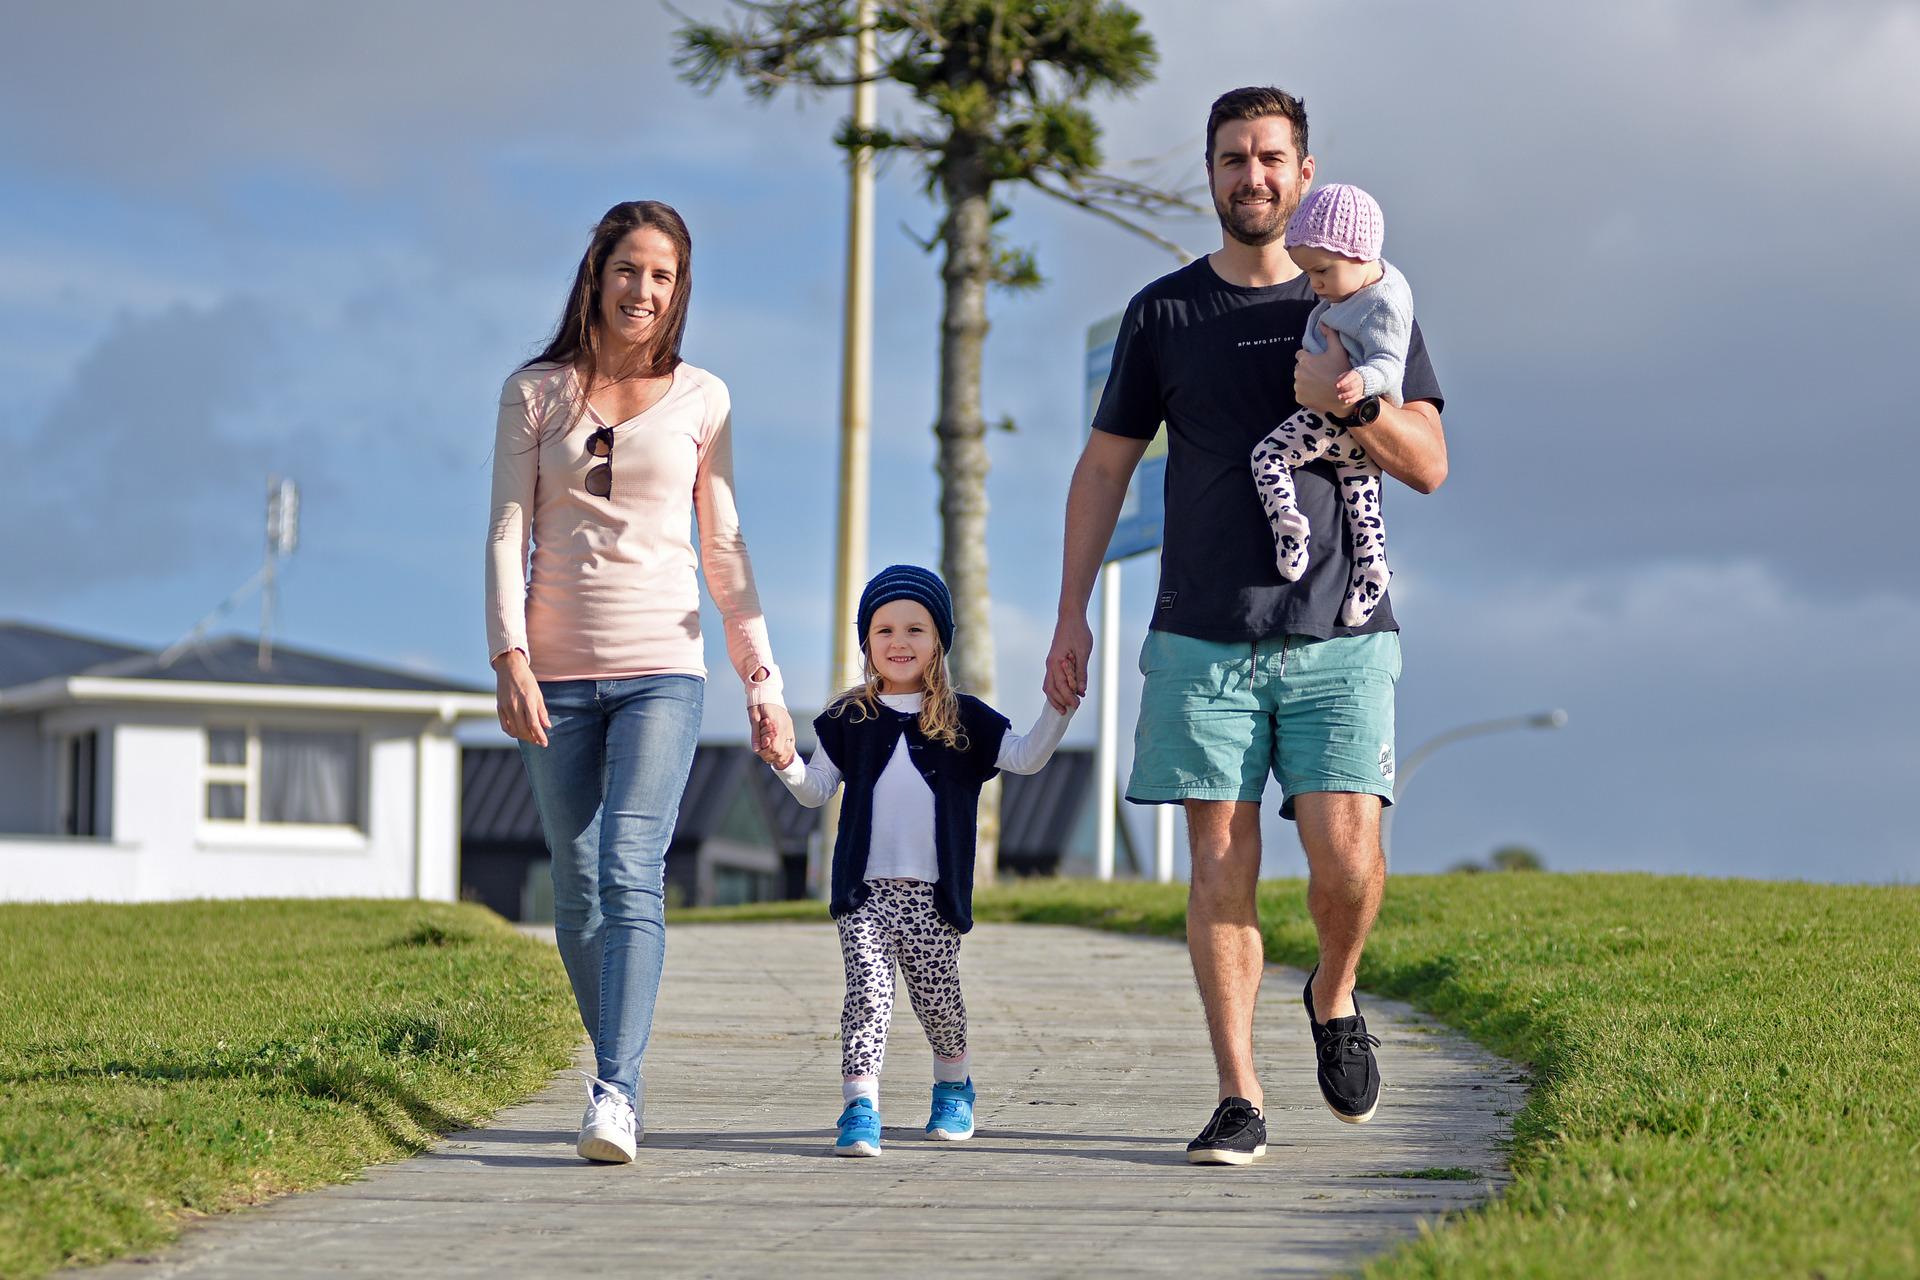 1f6d74d08 Expect the unexpected, say Tauranga parents following Jacinda Ardern's  birth announcement - NZ Herald